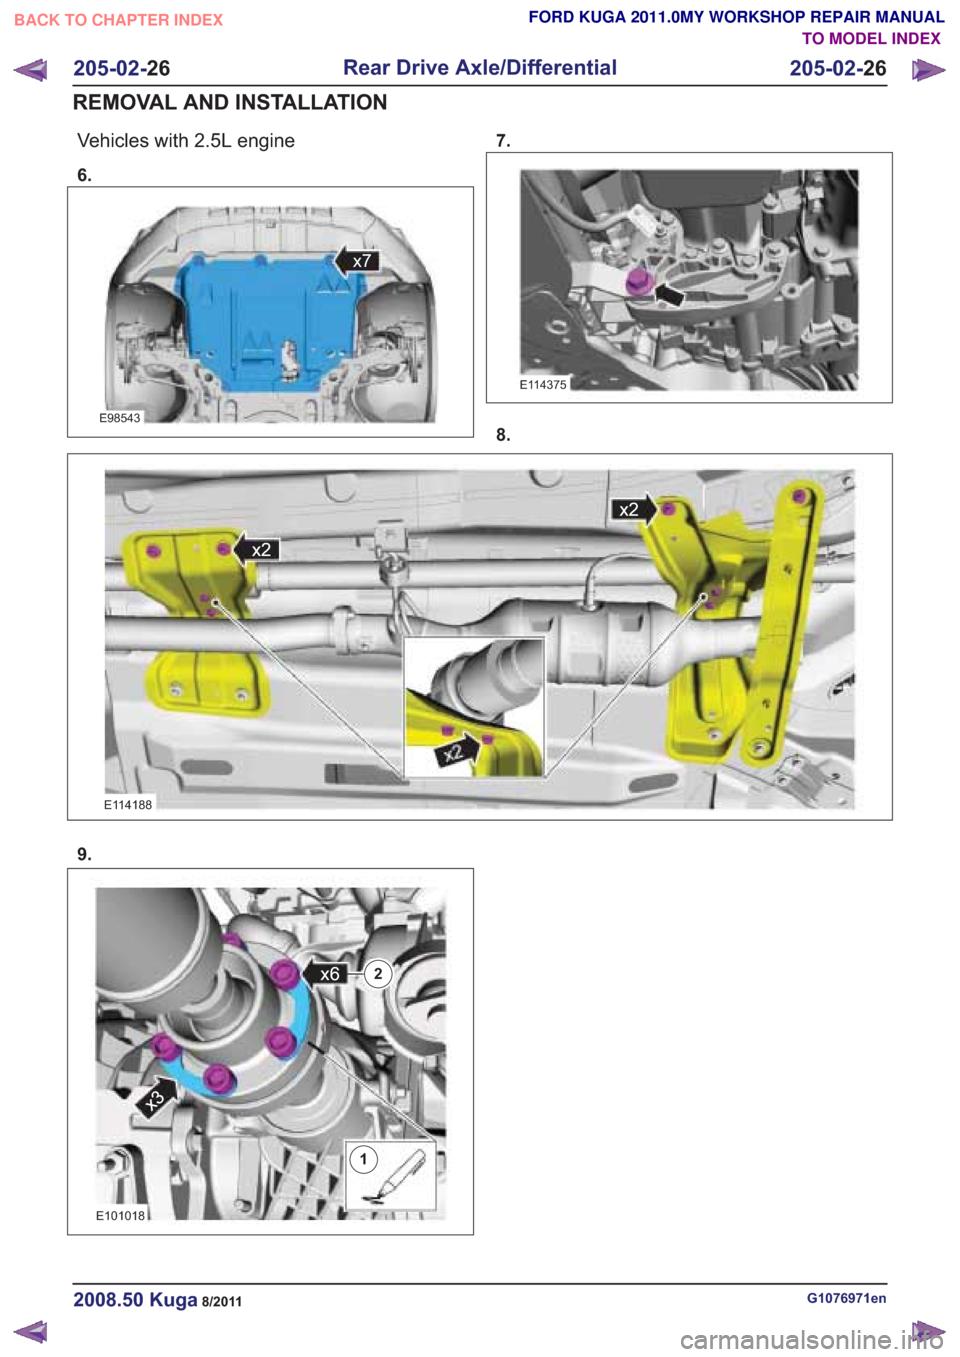 Image Result For Ford Kuga Battery Change